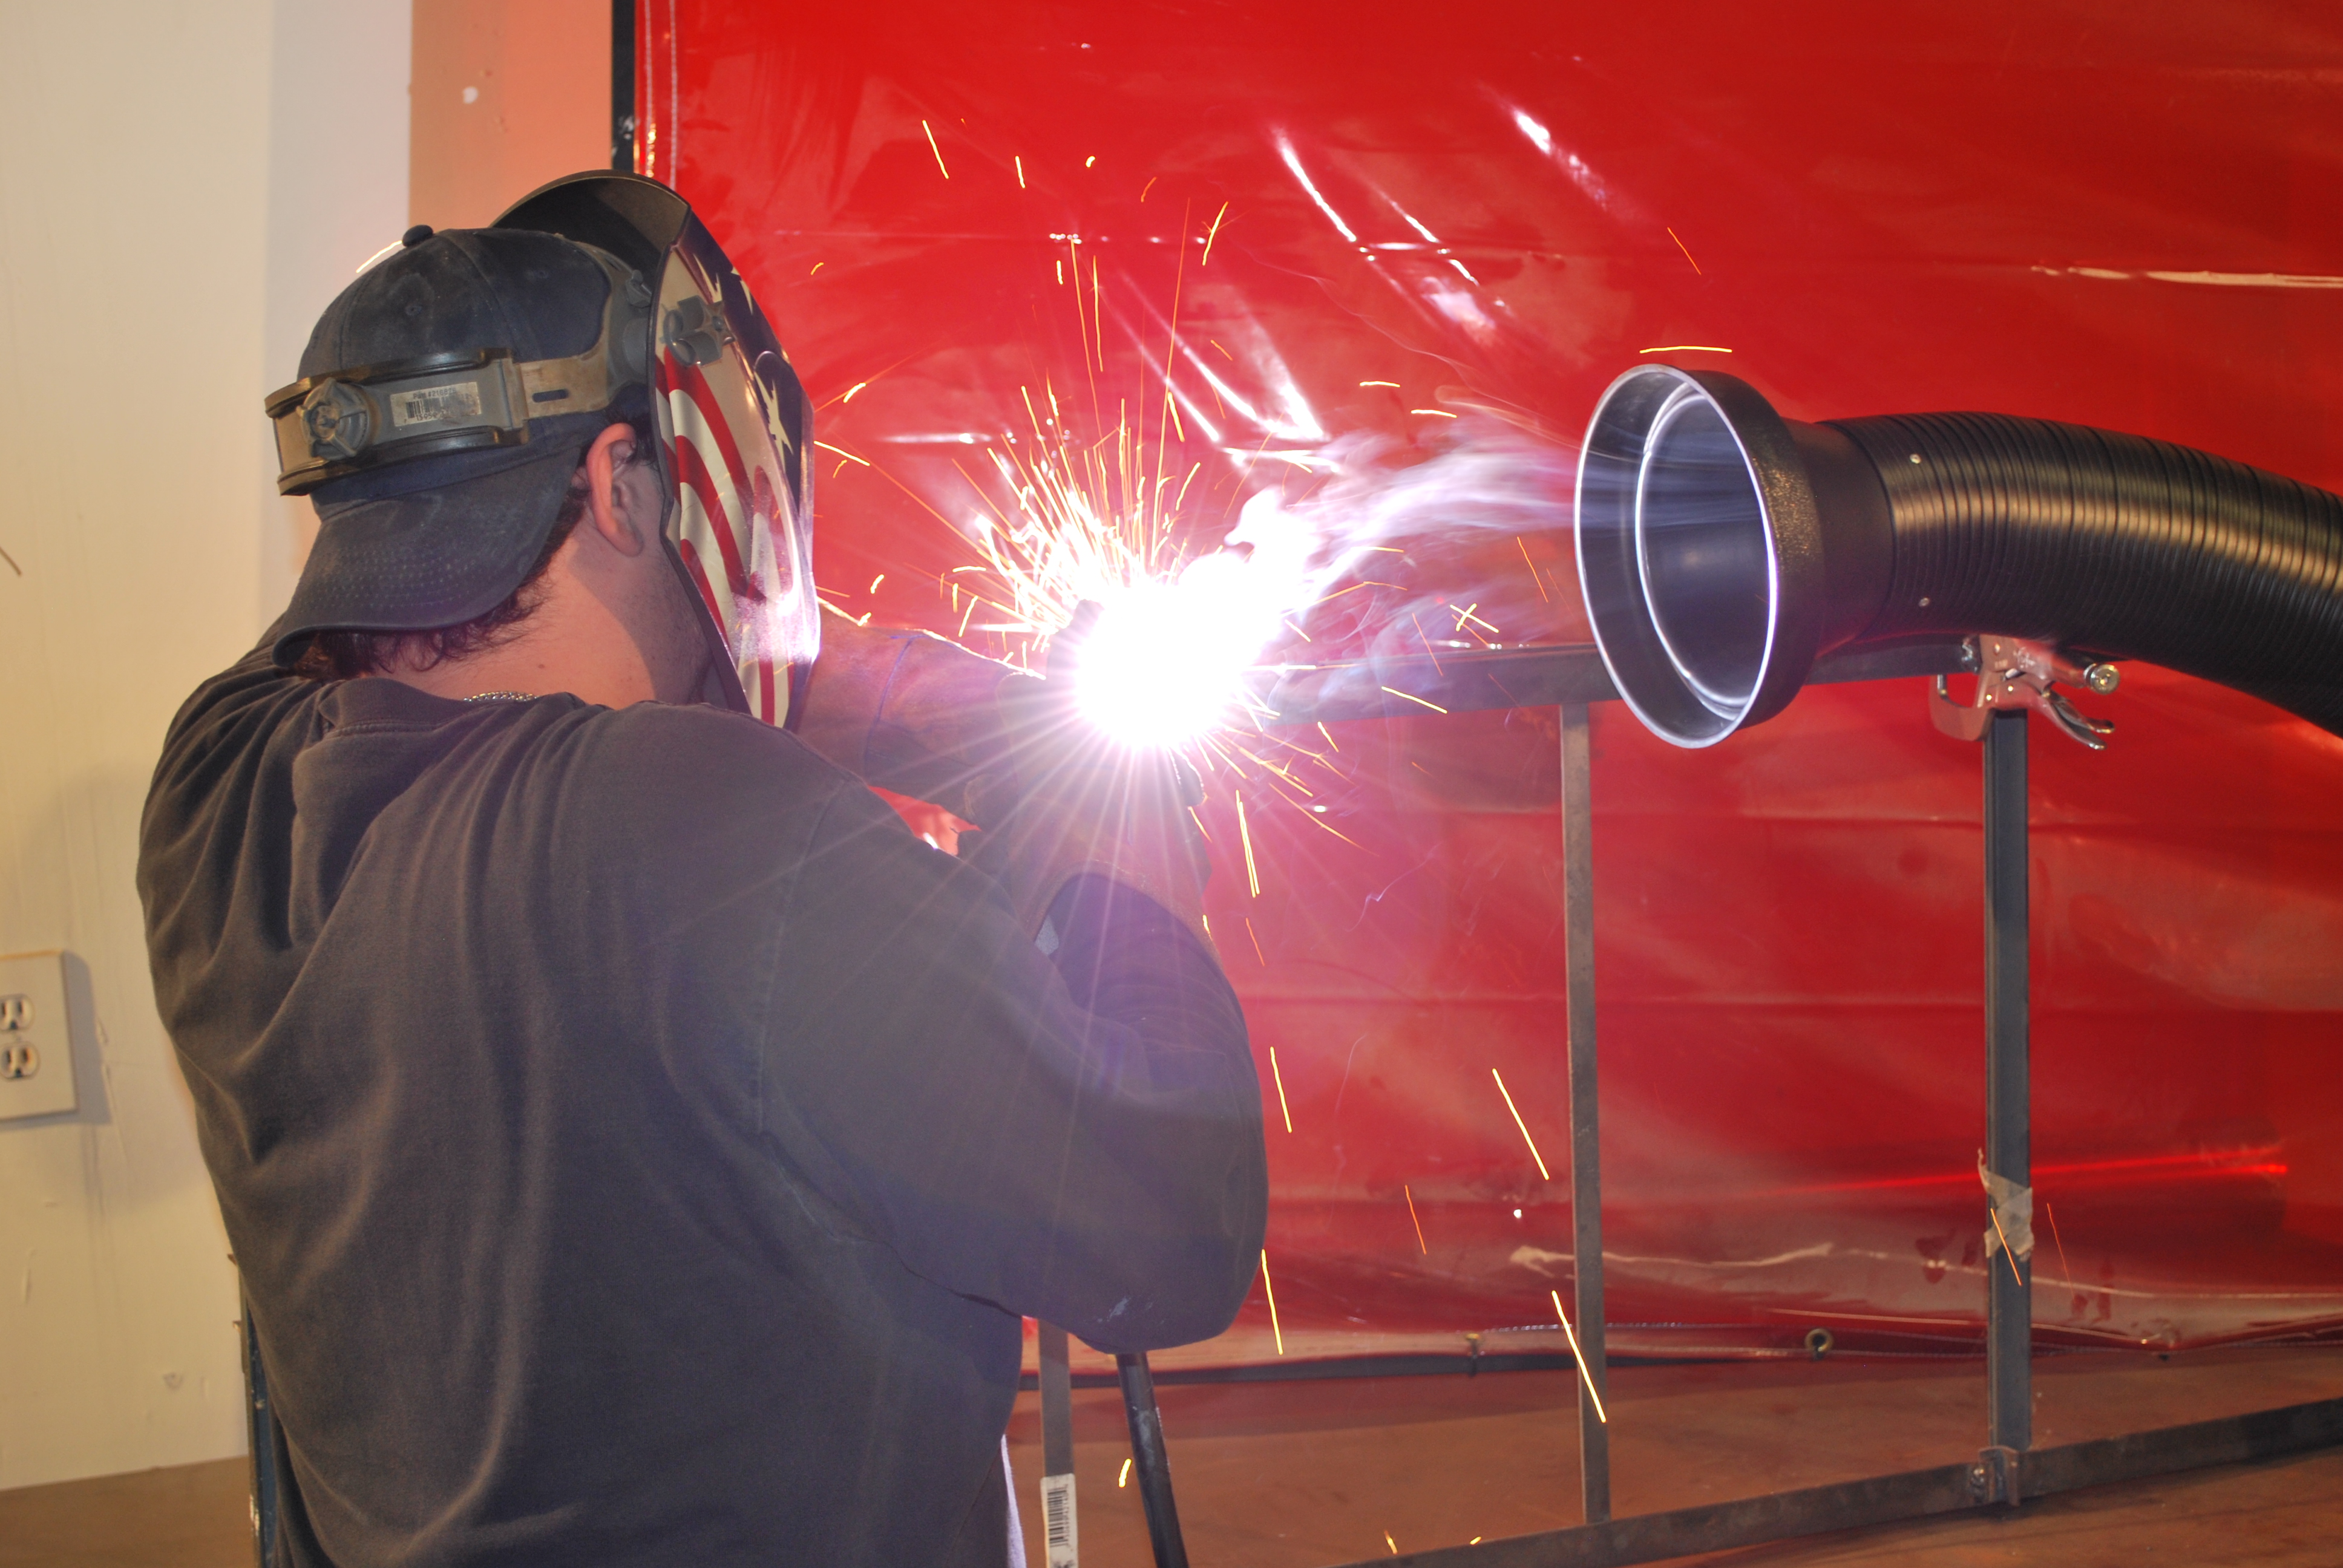 hazards of welding fumes - portable fume extractor